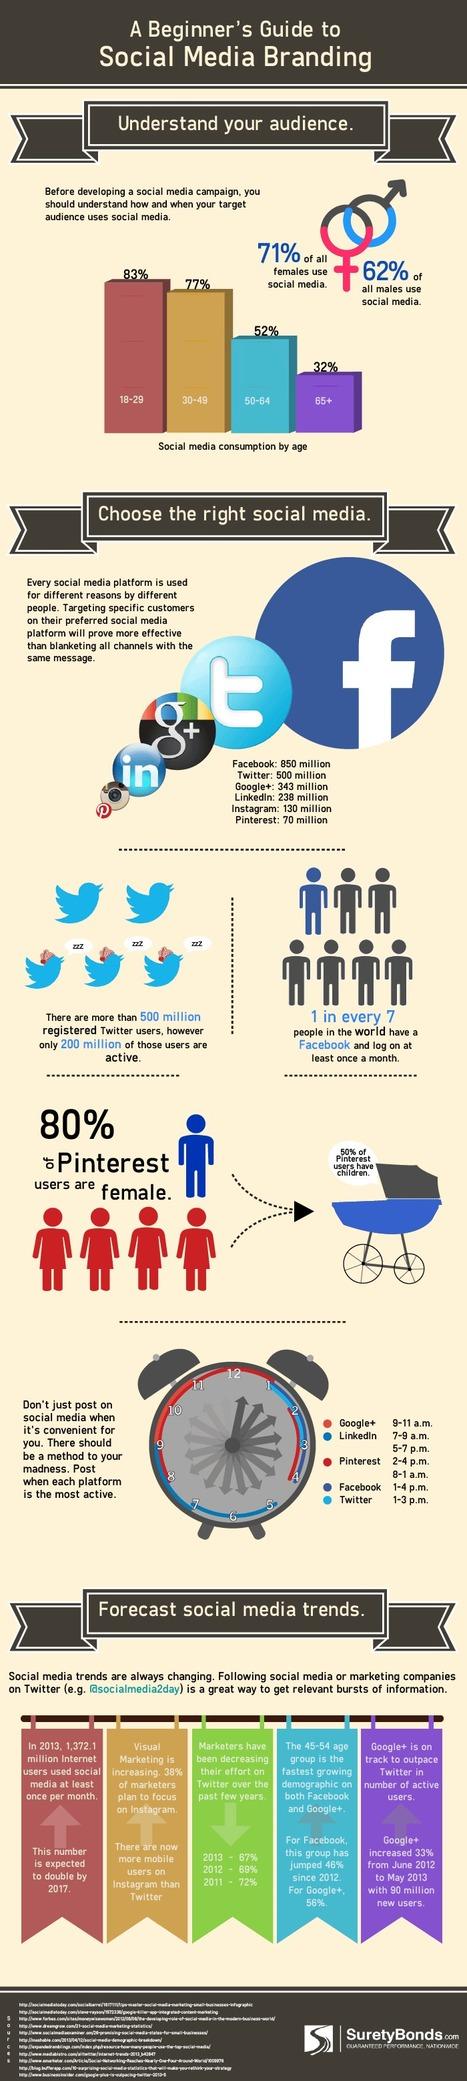 Social Media Branding Guide for Beginners | Super Social Media | Scoop.it